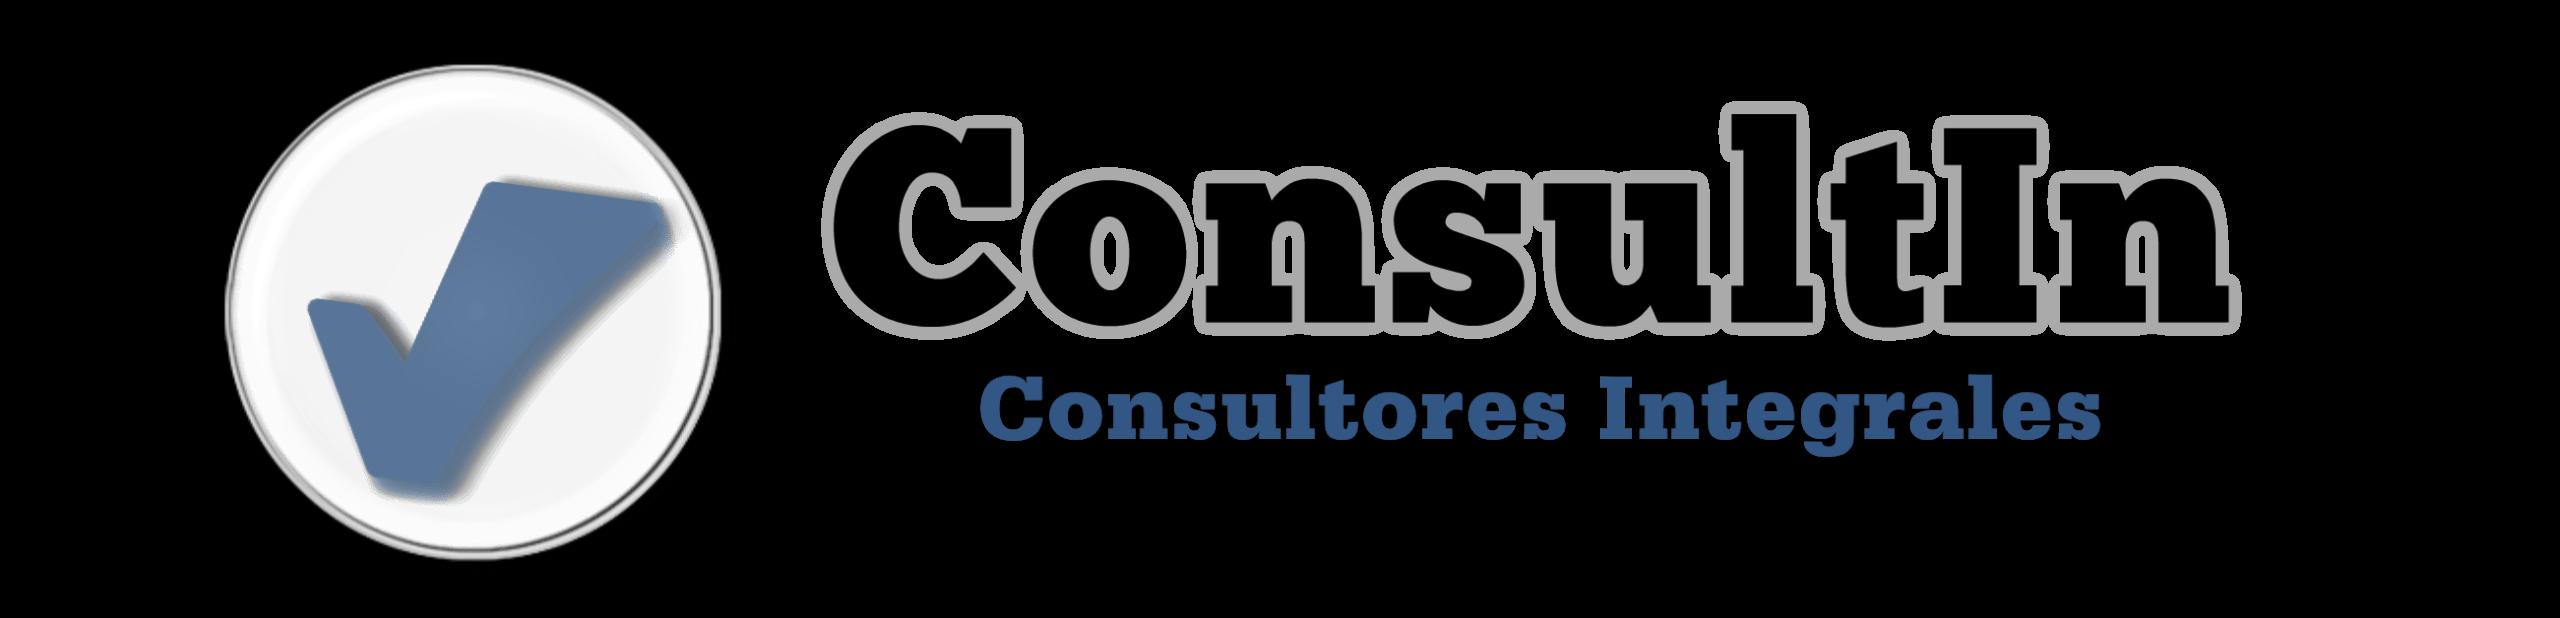 Consultin inmobiliaria en manresa pisos en manresa for Pisos particulares manresa